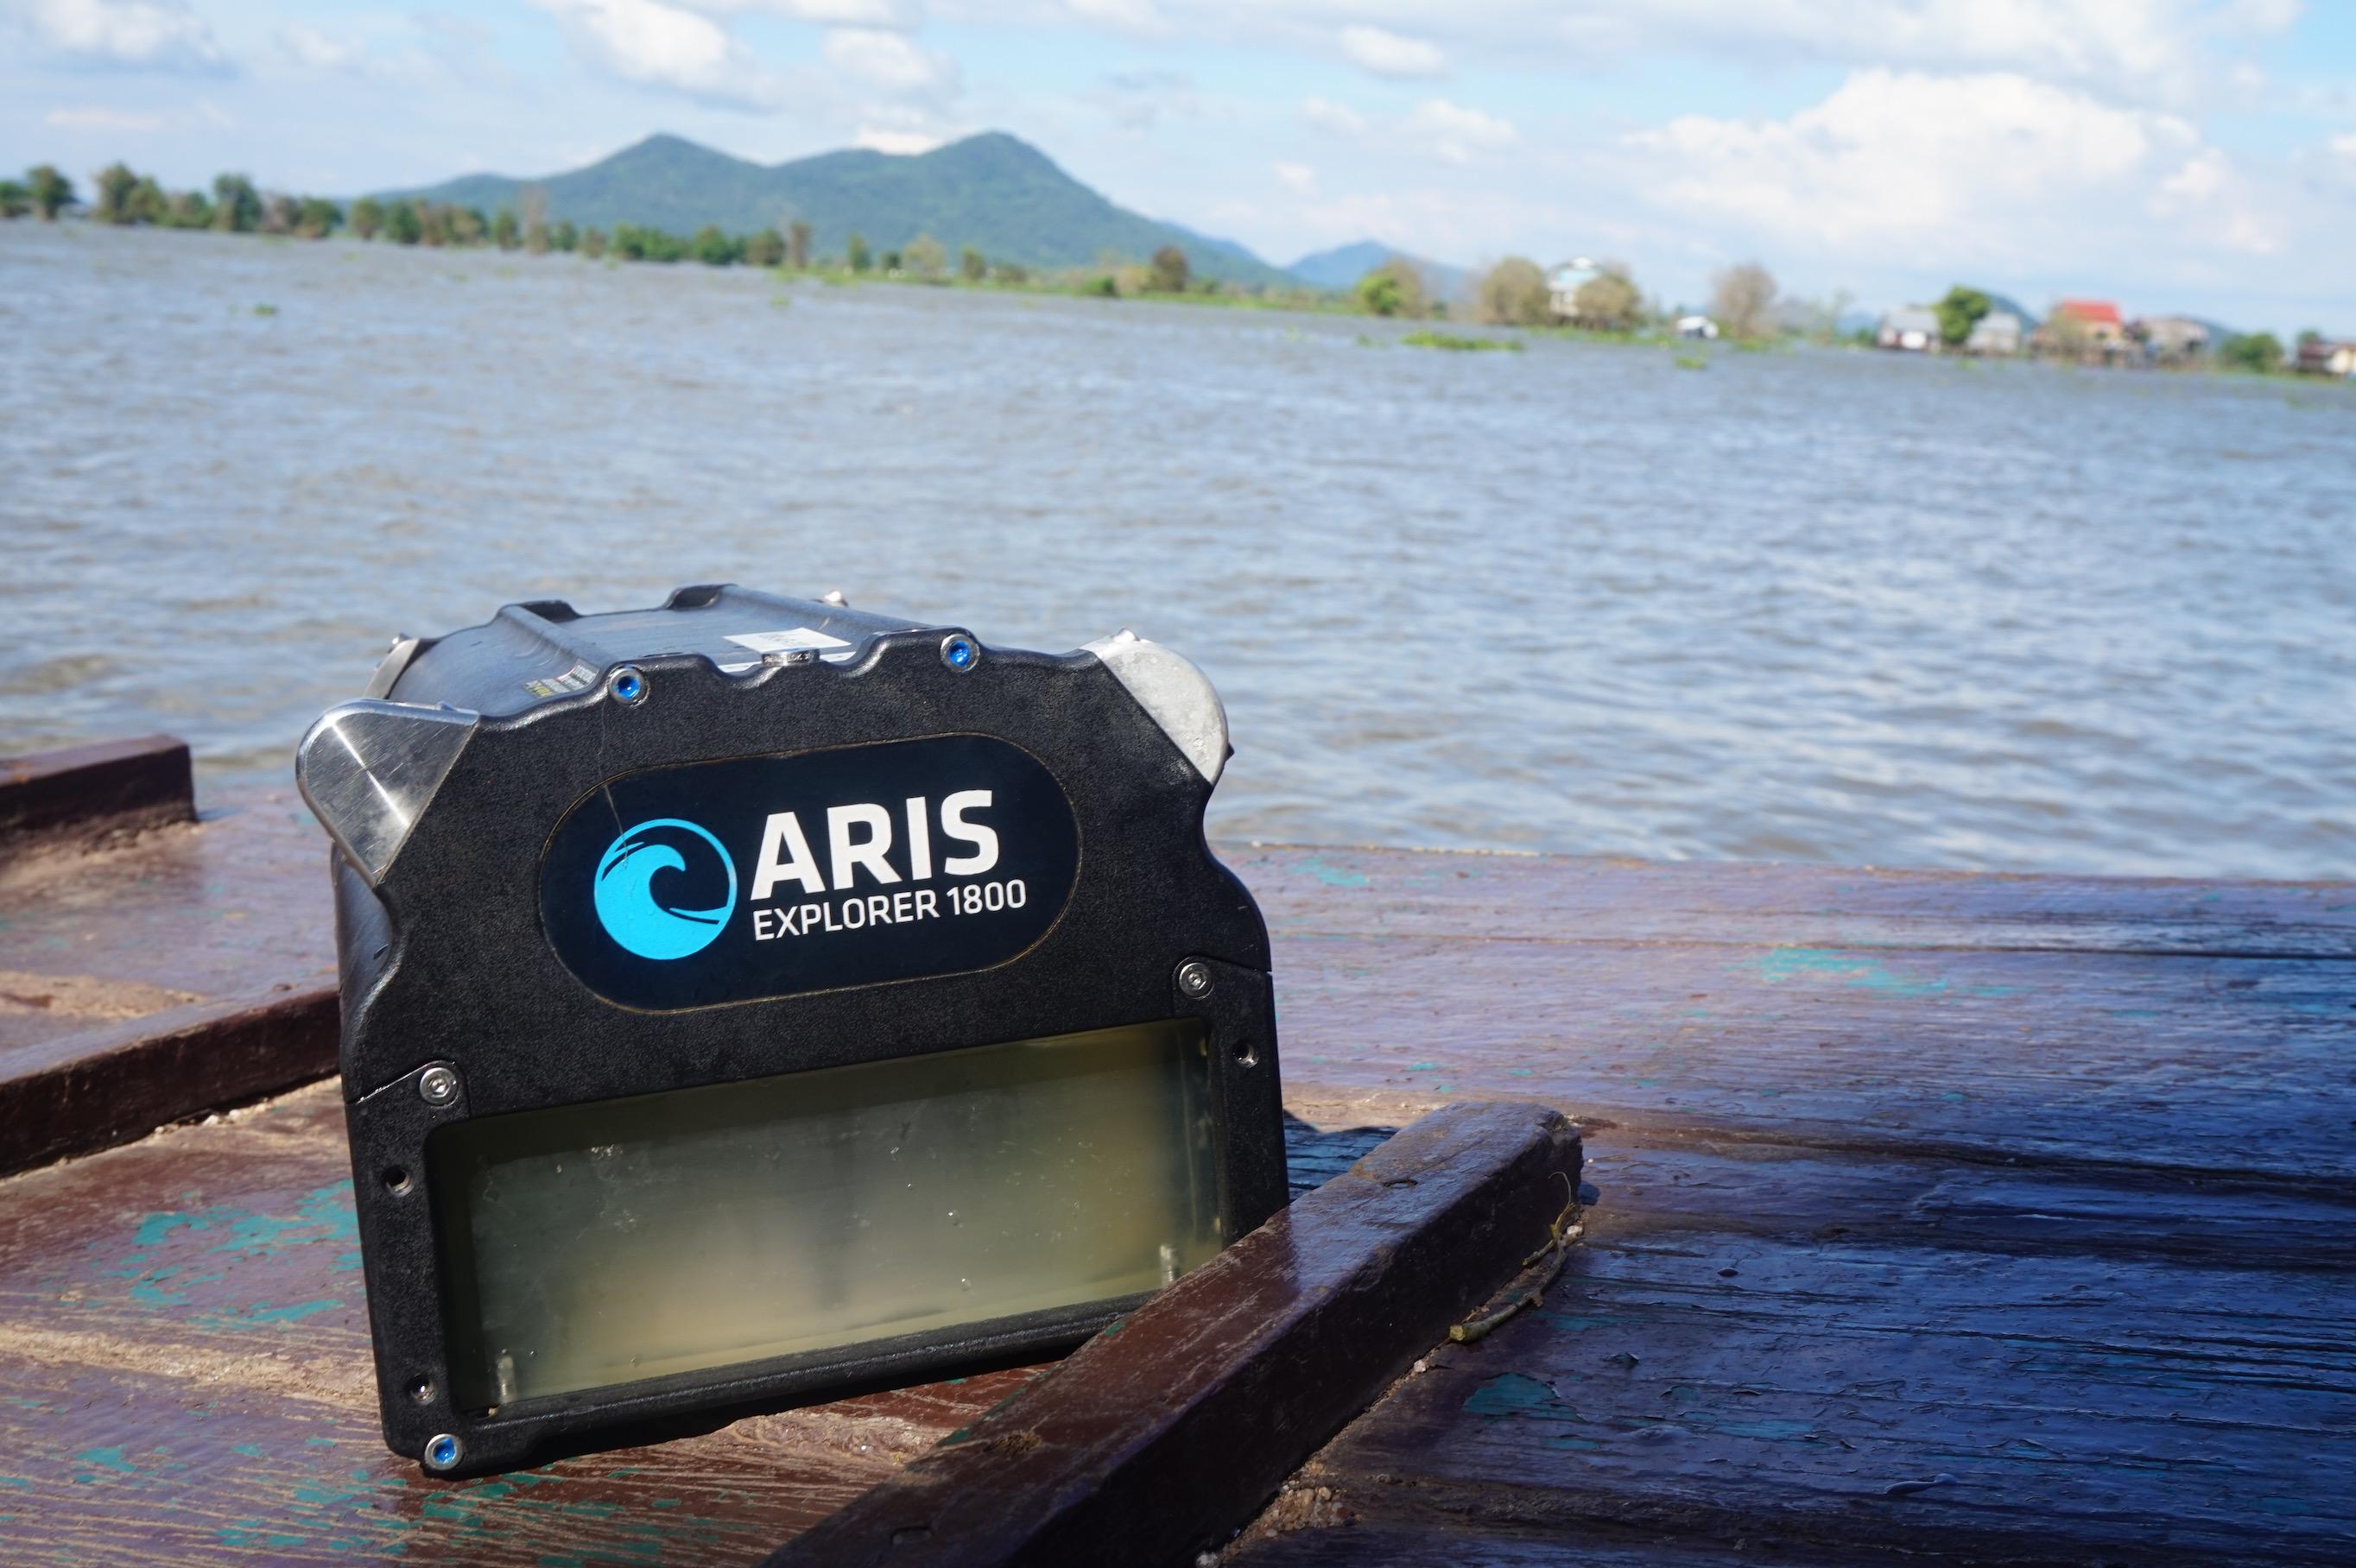 The ARIS camera at the Tonle Sap River